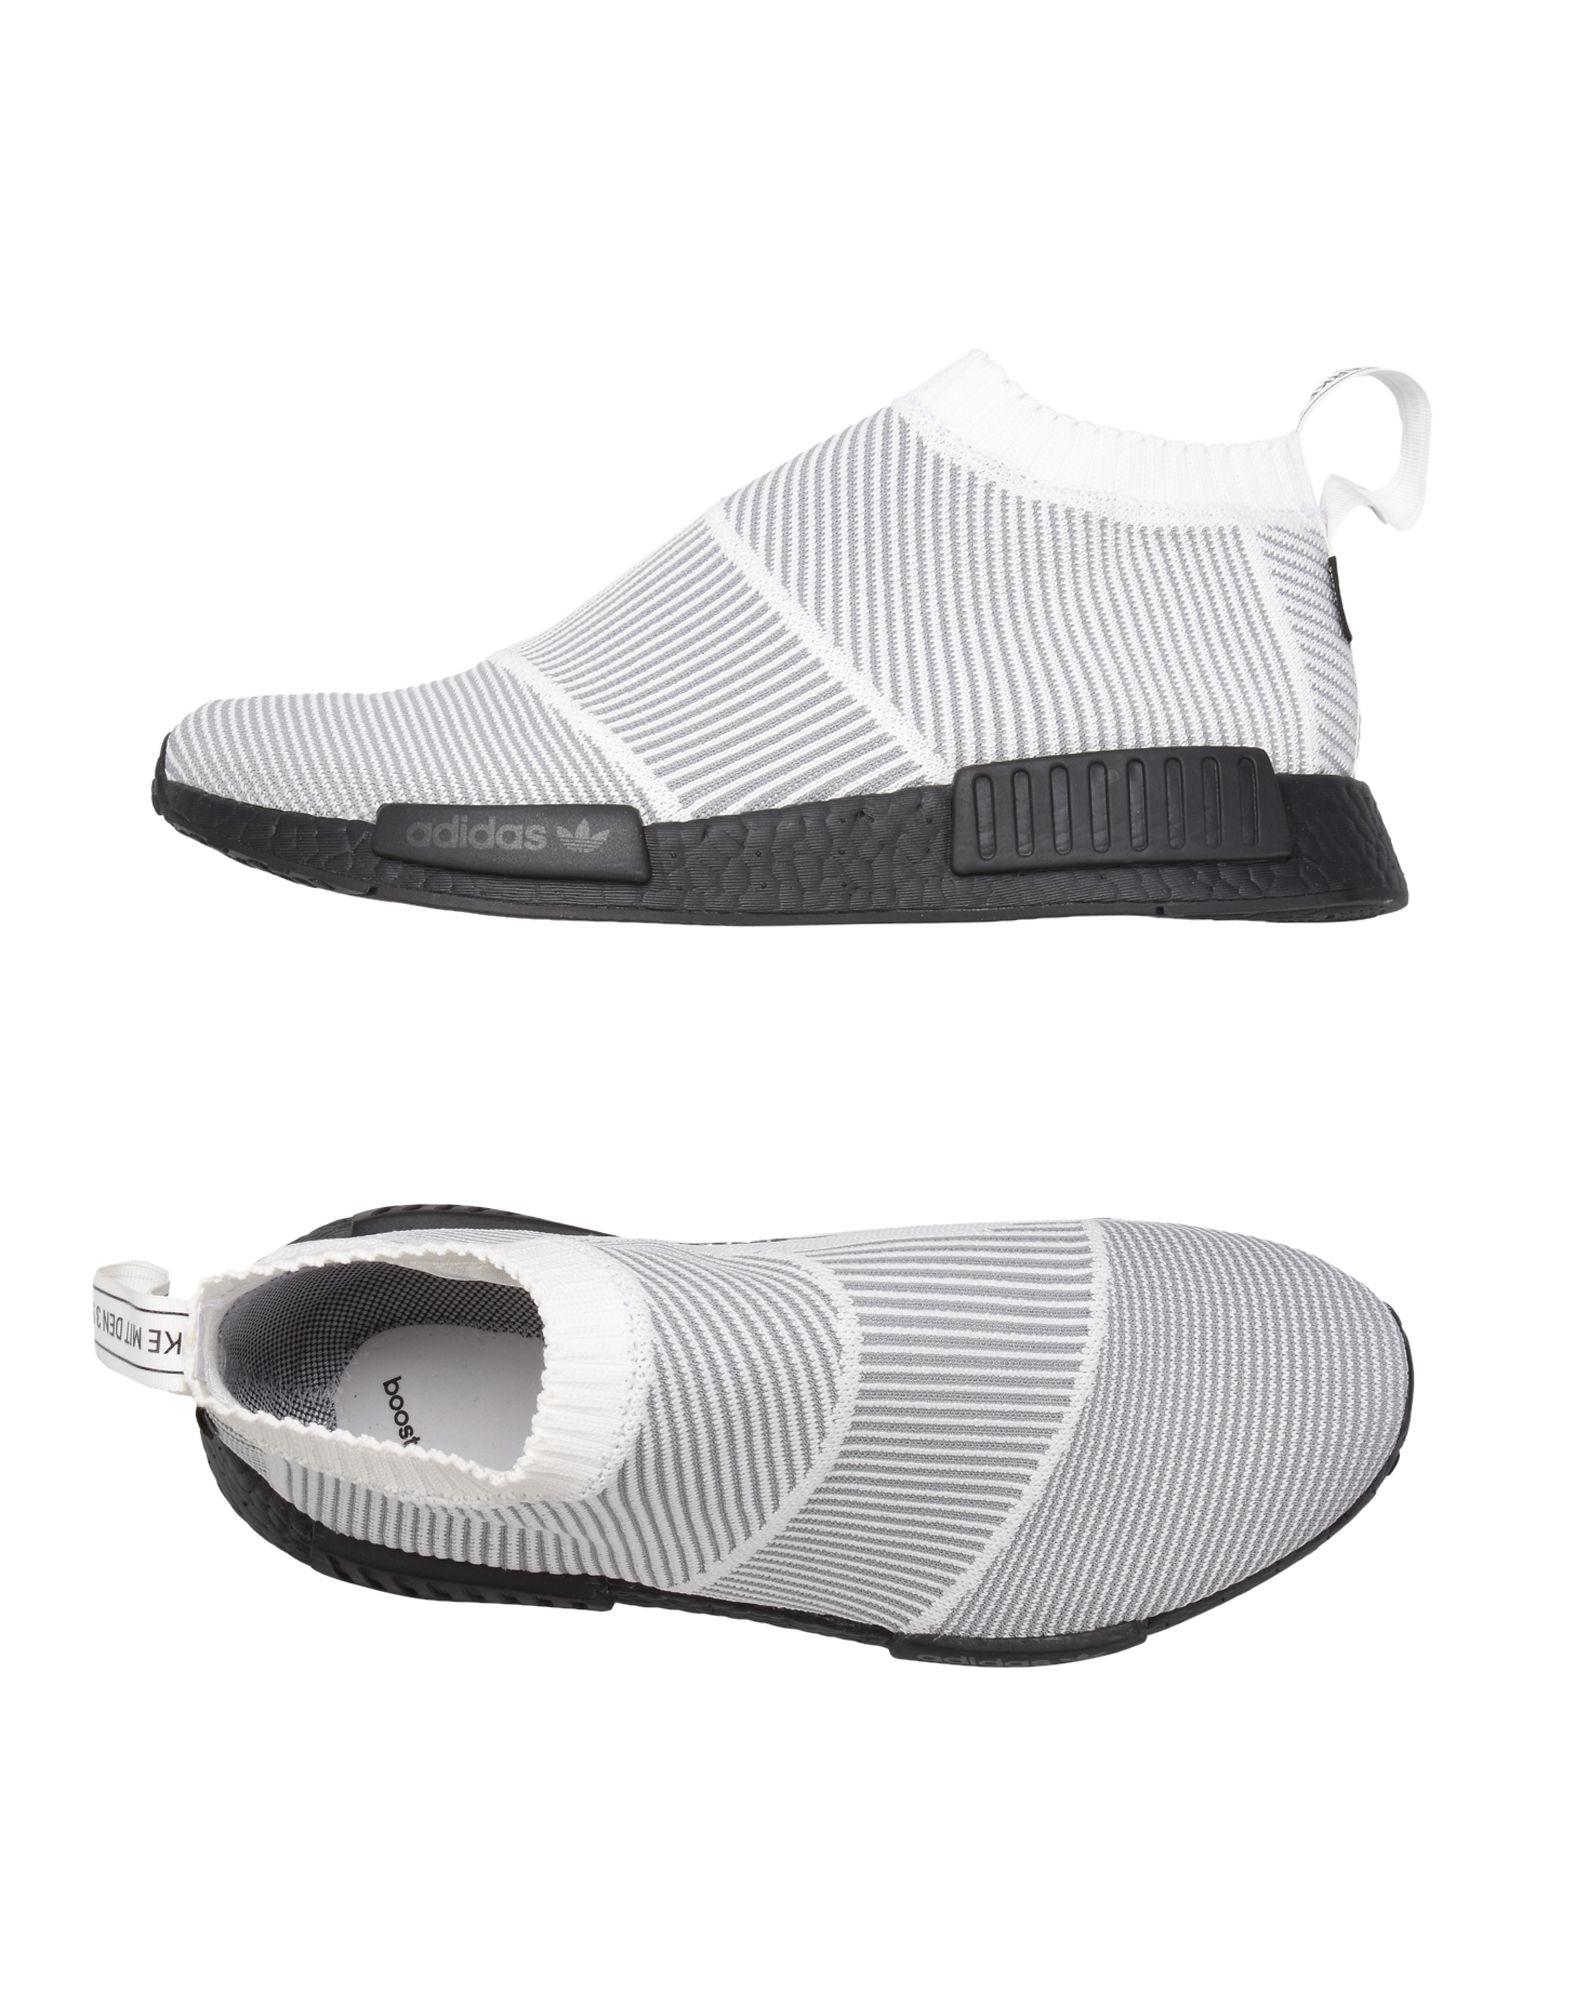 Adidas Originals Gute Nmd_Cs1 Gtx Pk  11413713RO Gute Originals Qualität beliebte Schuhe 1a3e4b